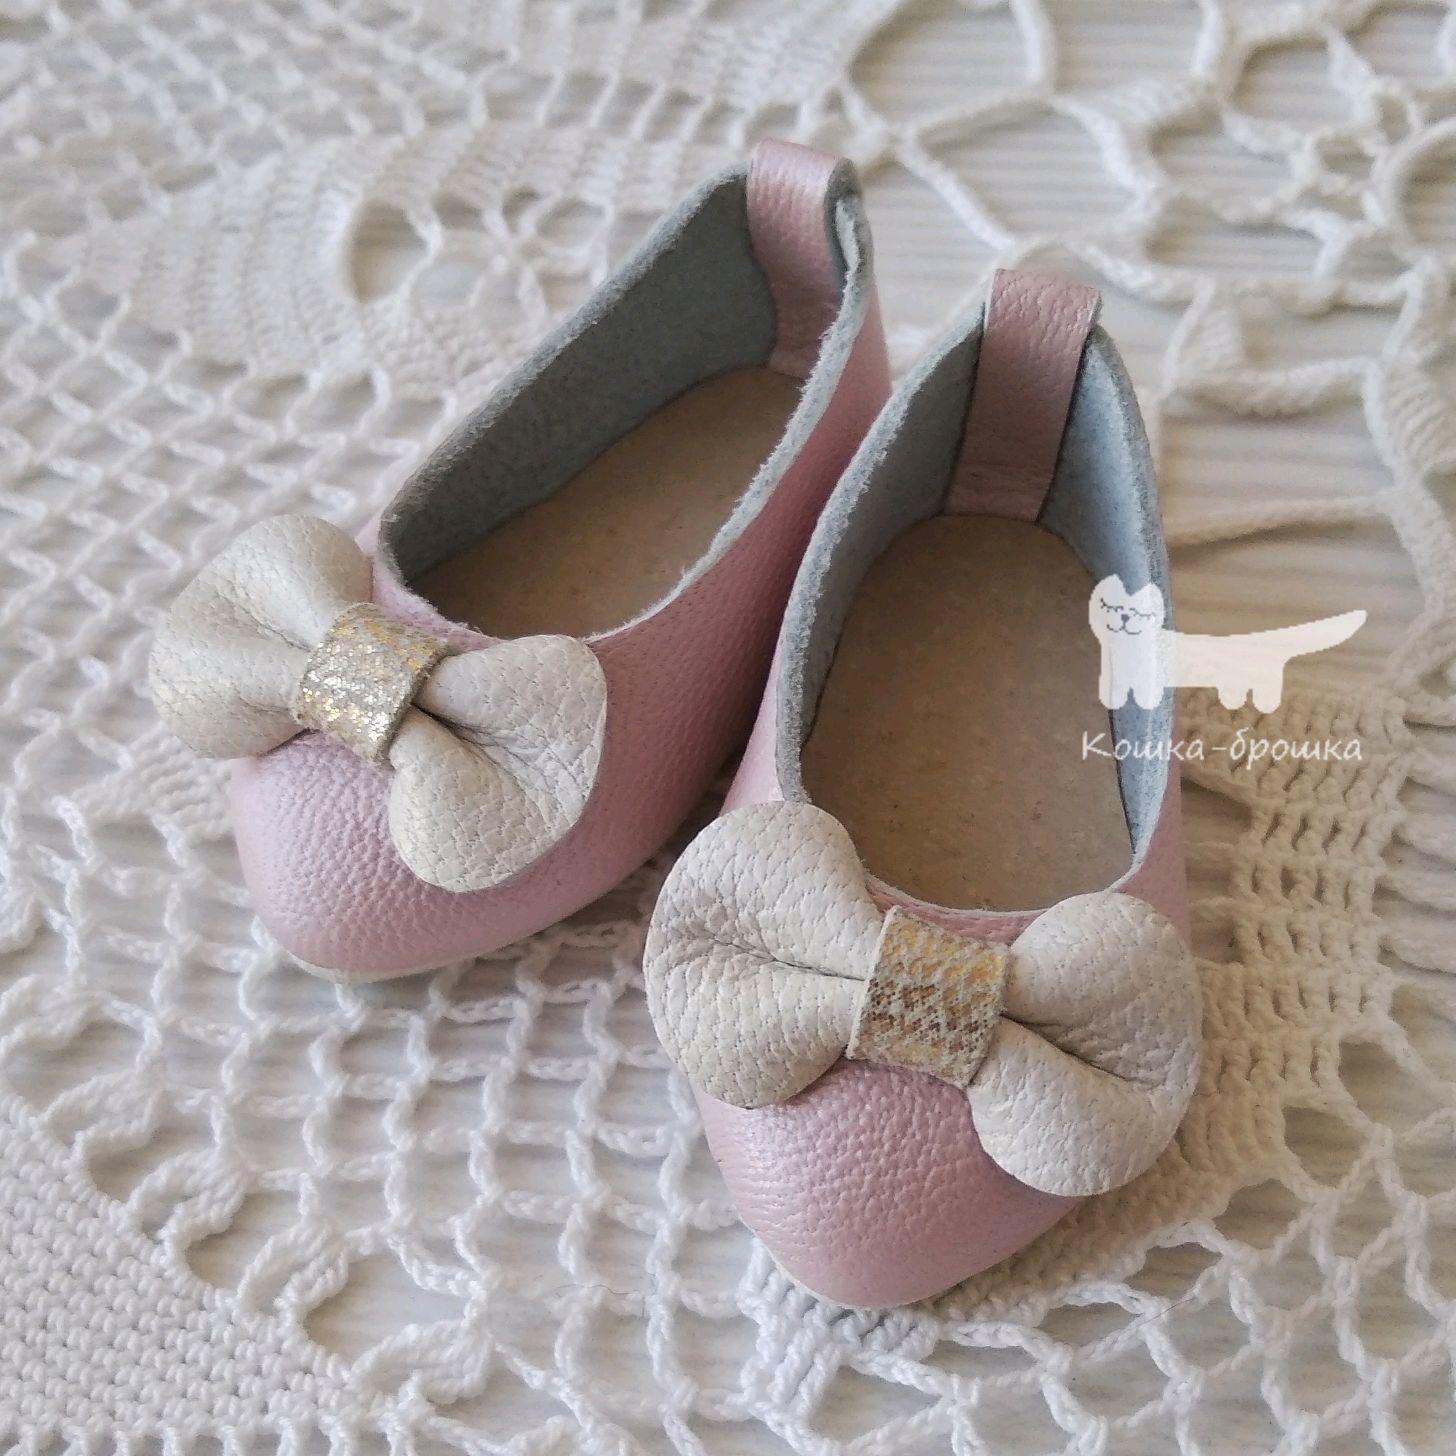 Туфли лодочки для куклы Paola Reinа, Одежда для кукол, Санкт-Петербург,  Фото №1